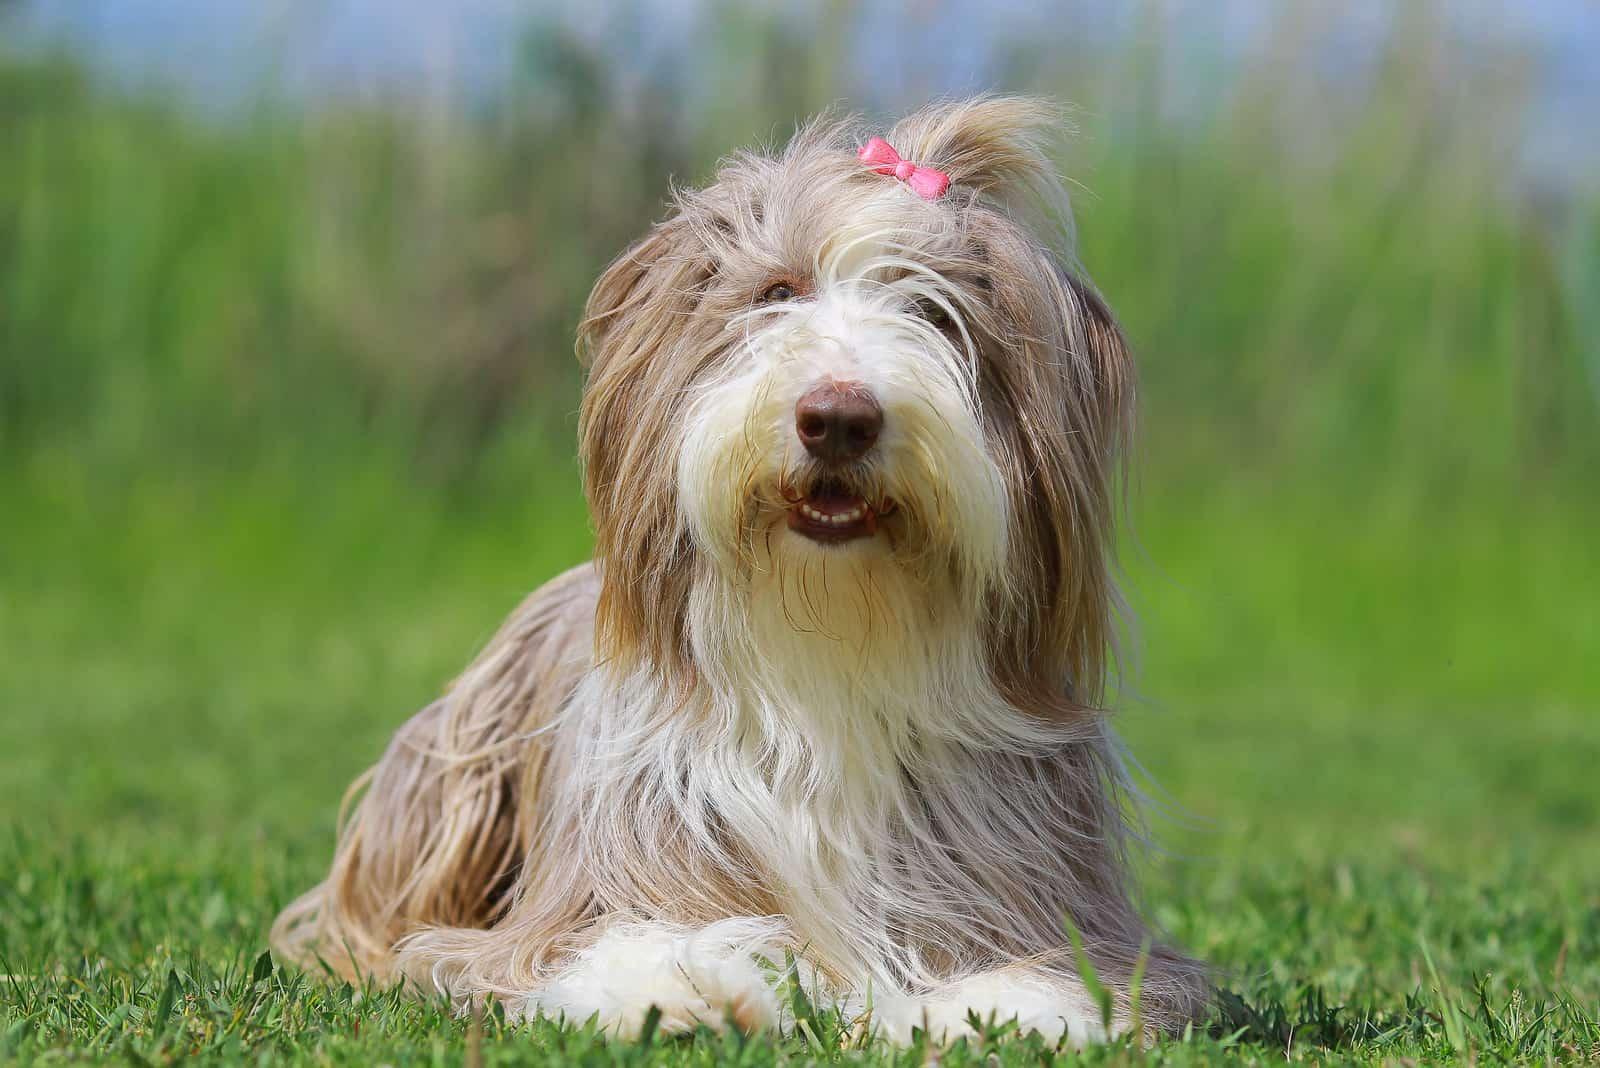 bärtiger Collie-Hund liegt auf dem Gras